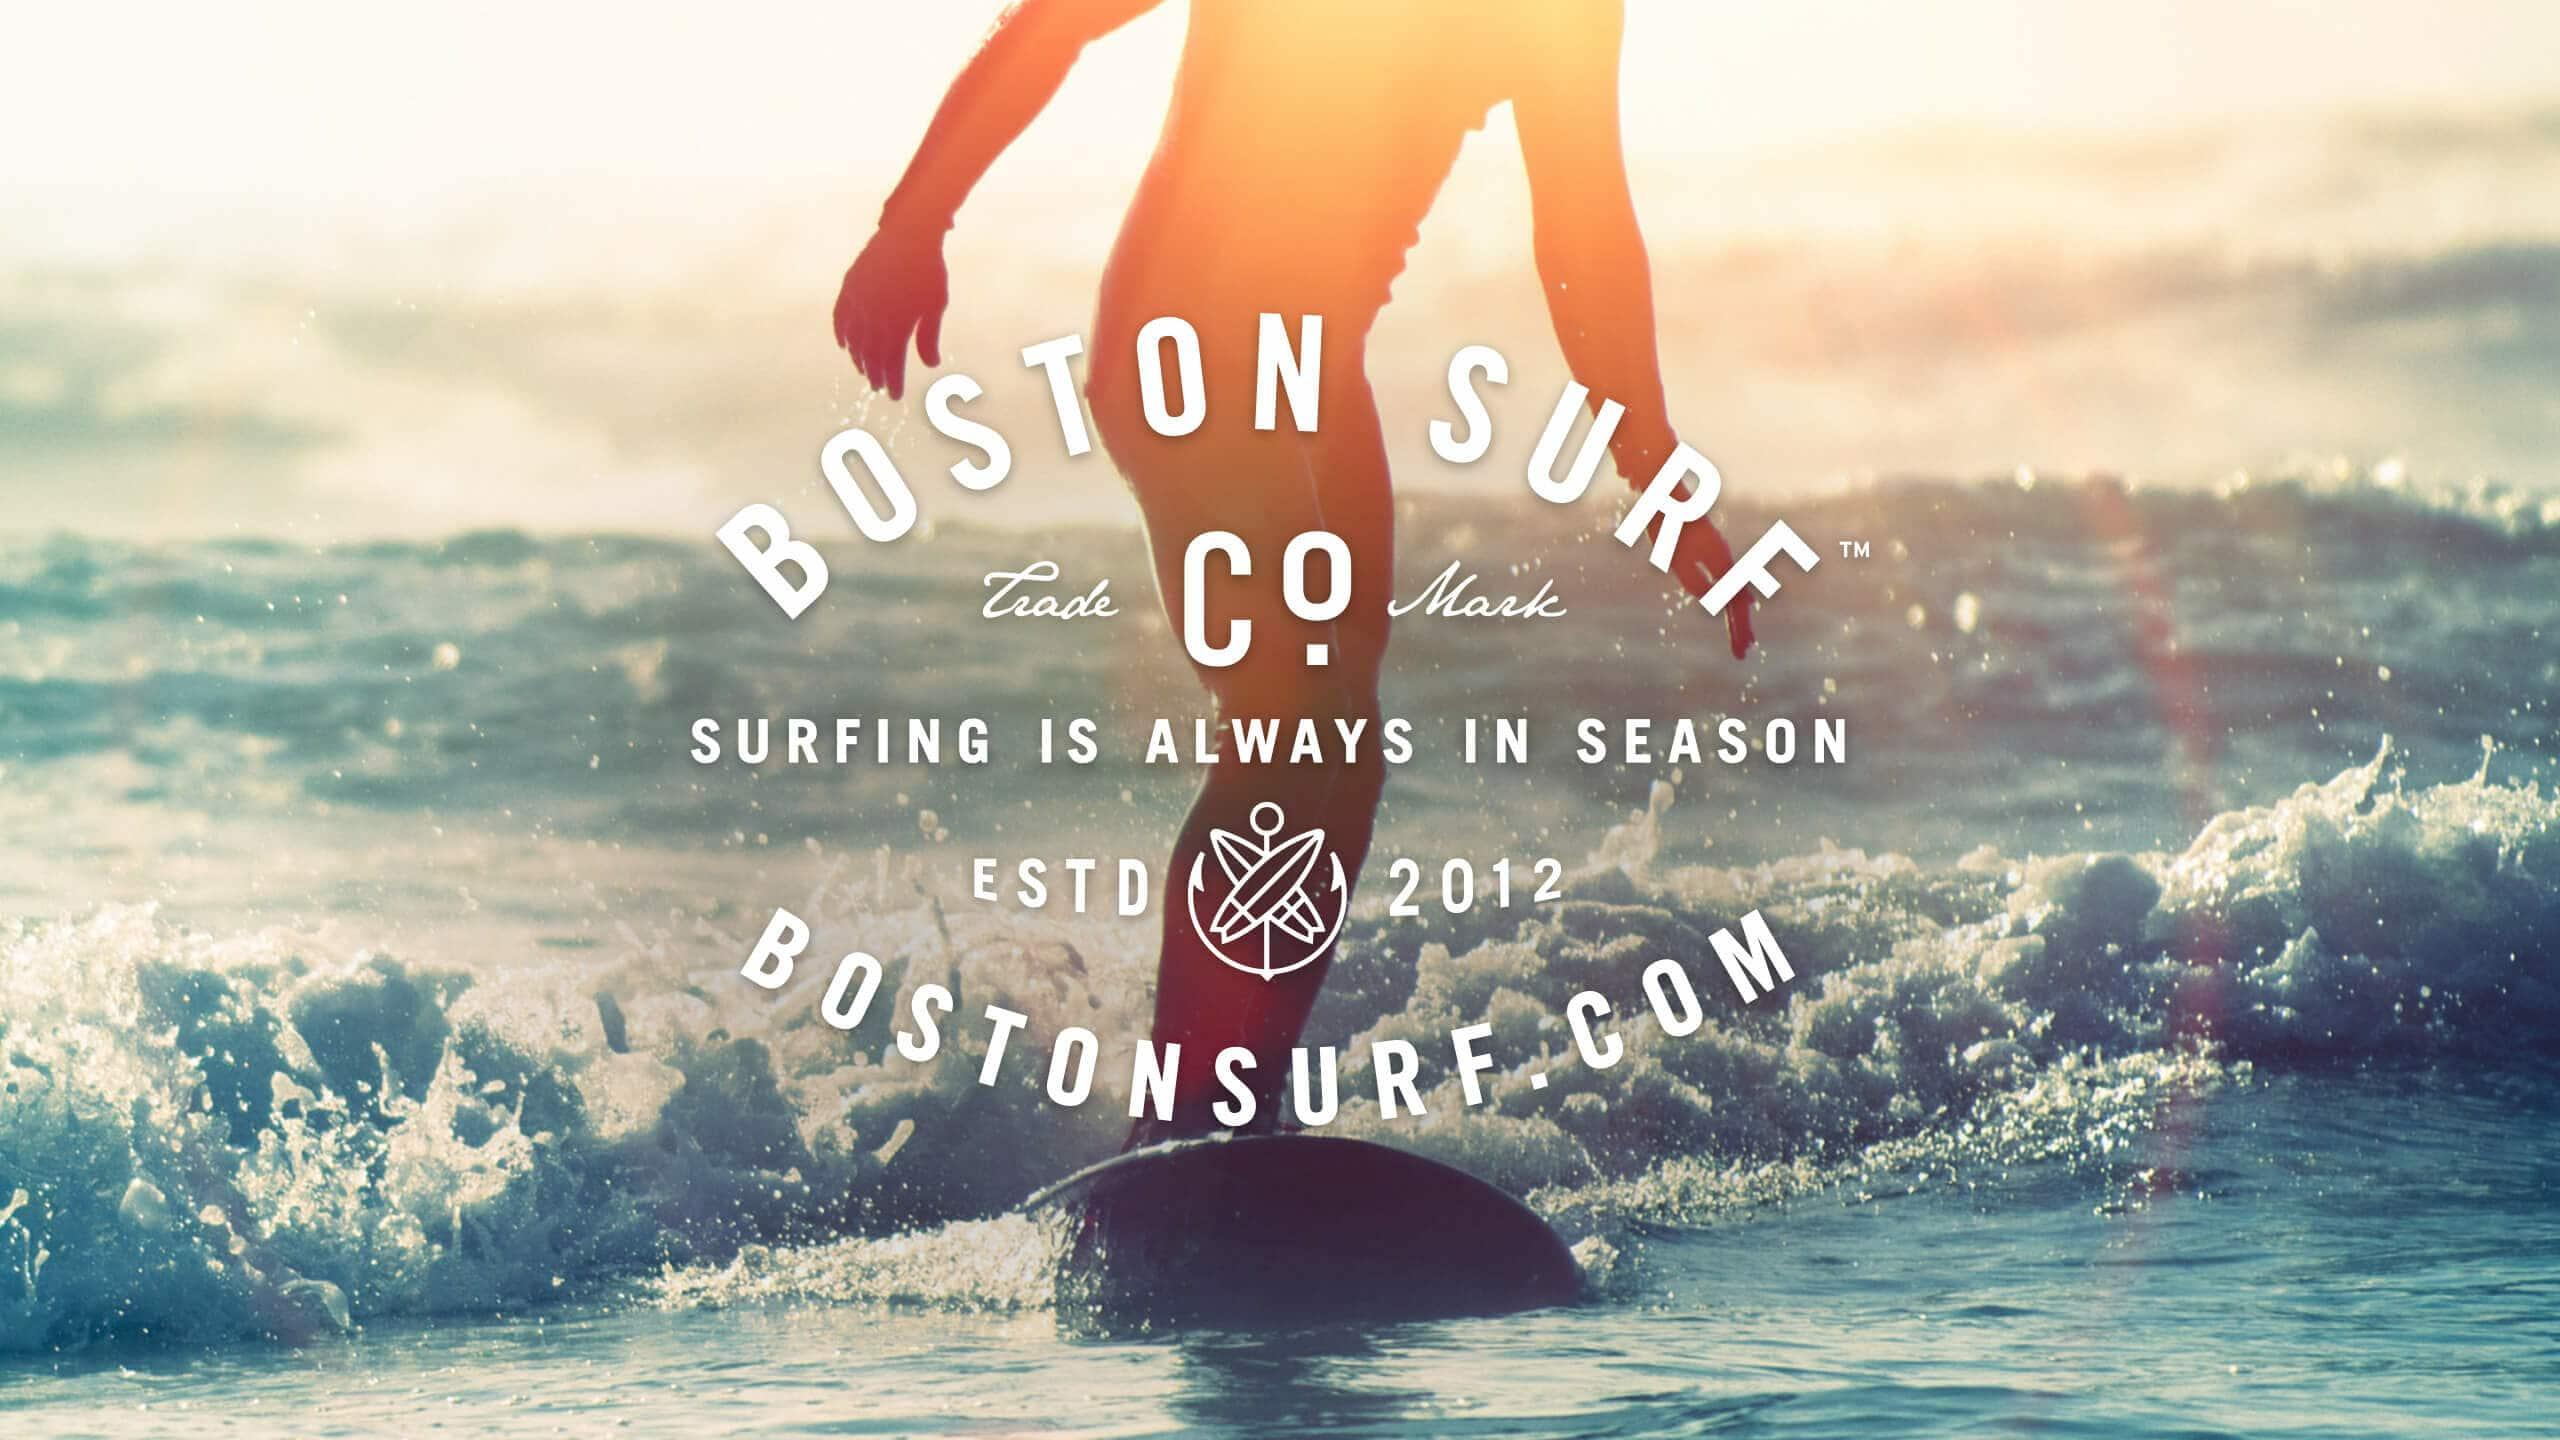 Sprout studios, Boston, Boston Surf Co, Chino surfboards, surfing, branding, brand, logo design, graphic design, website design, digital design, apparel